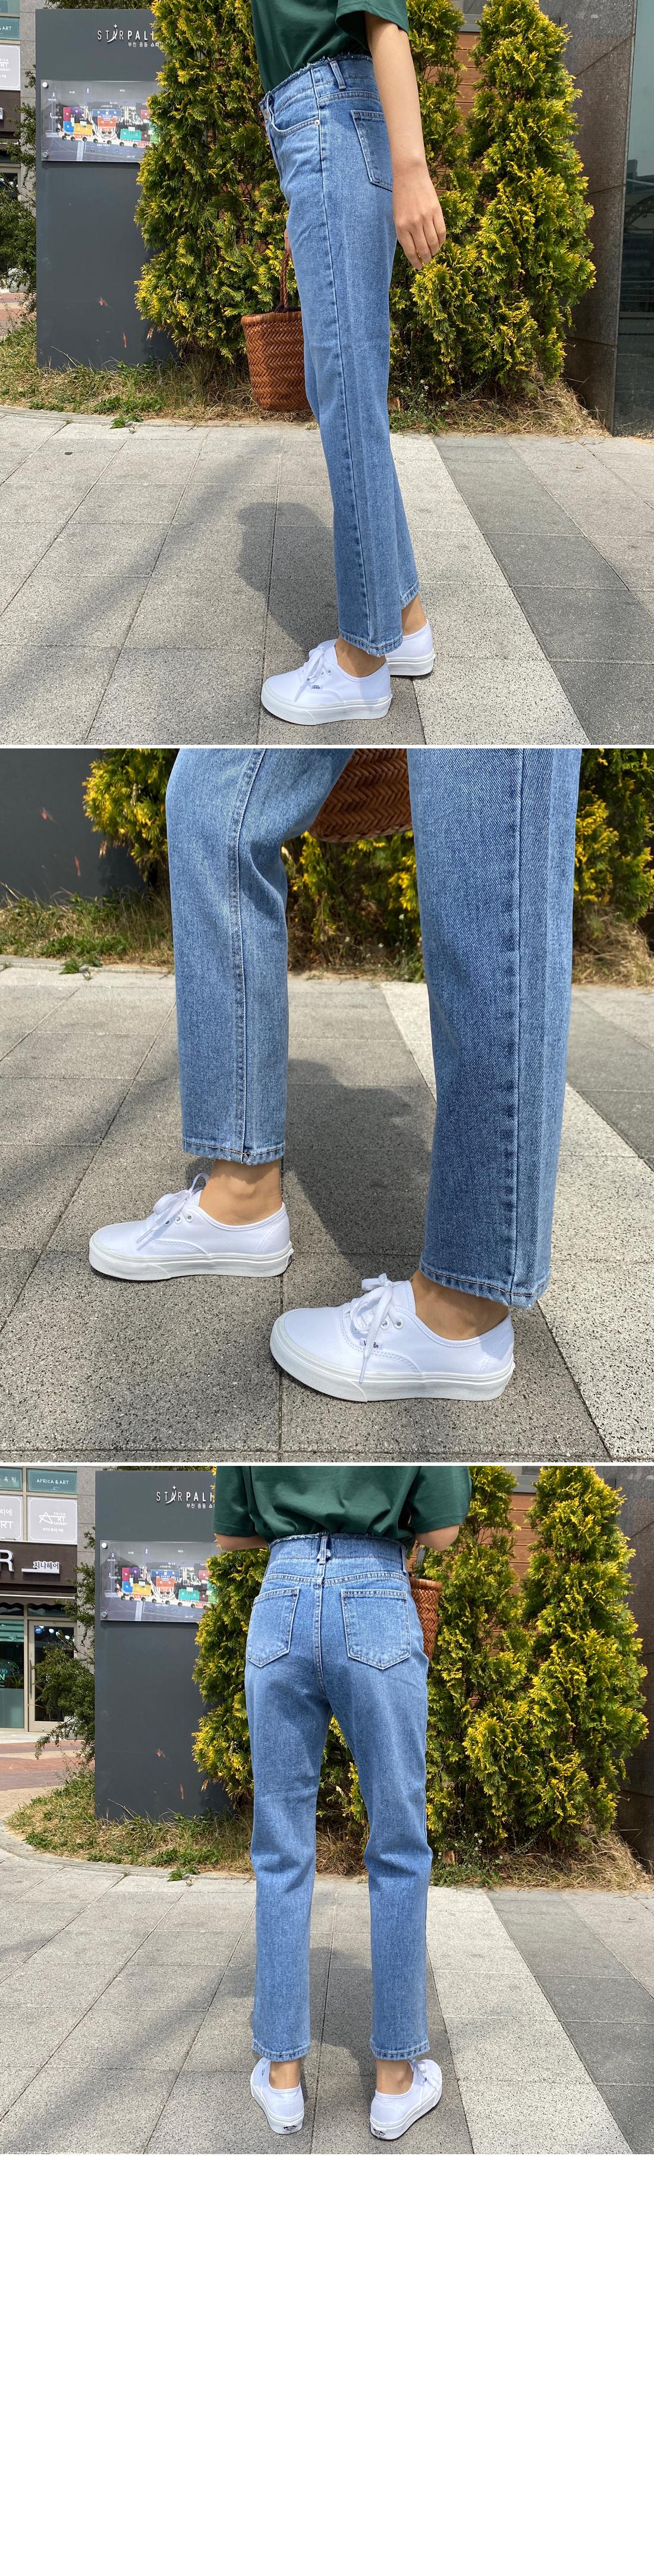 Obi cut loose fit jeans